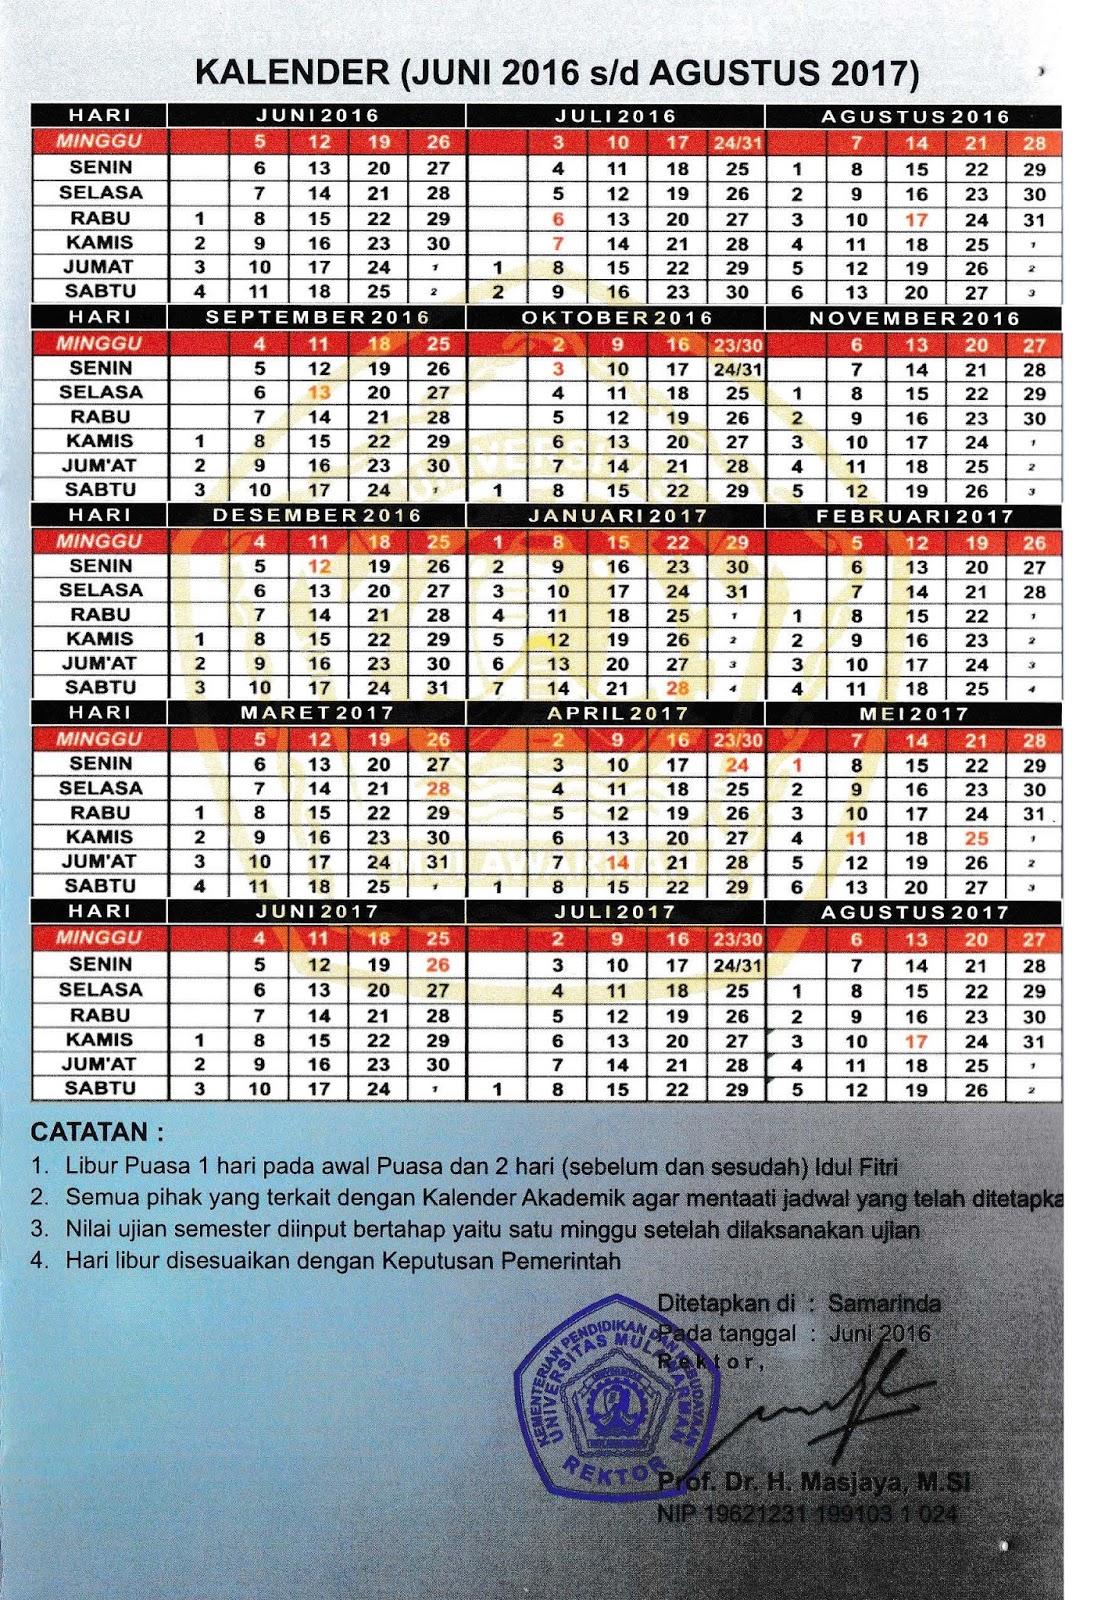 Kalender akademik2016-2